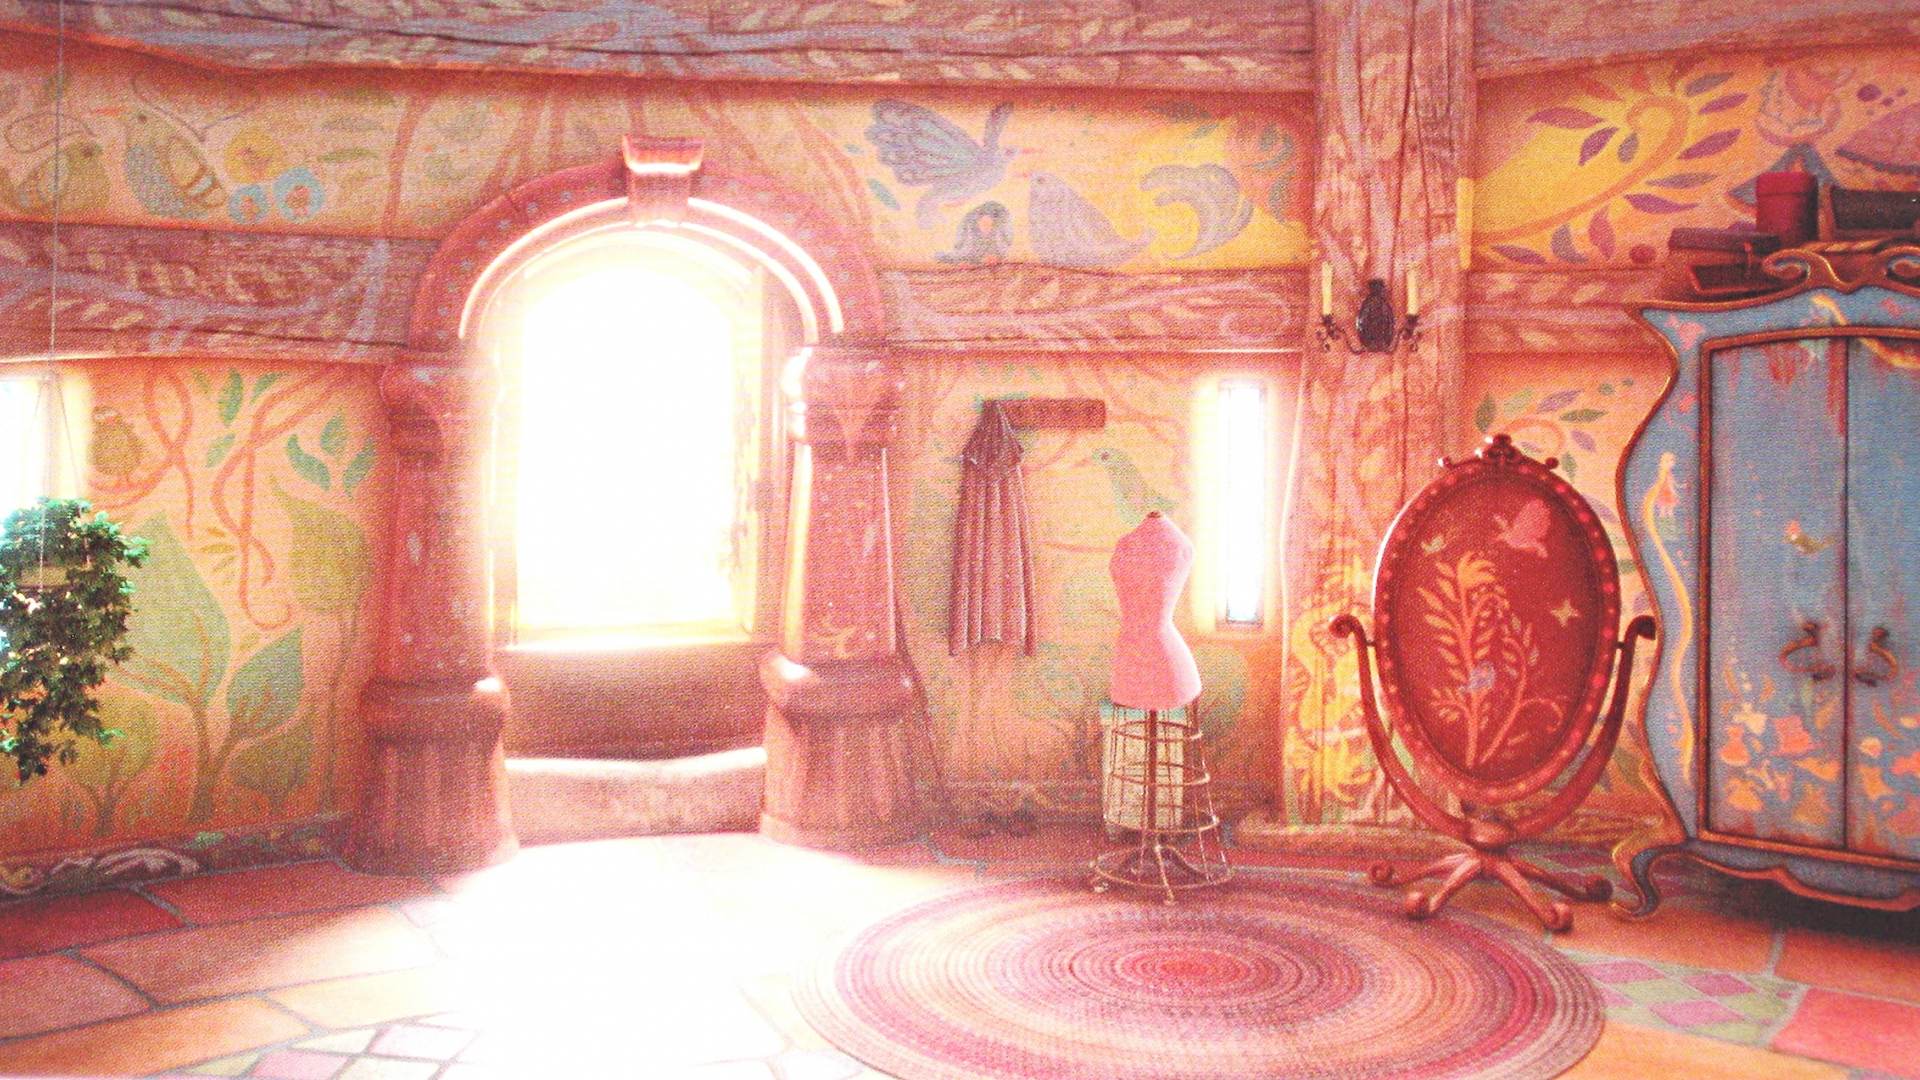 Free Download Walt Disney Characters Images Walt Disney Backgrounds Tangled Hd 2560x1273 For Your Desktop Mobile Tablet Explore 76 Disney Tangled Wallpaper Rapunzel Wallpaper Rapunzel Wallpaper Hd Tangled Floating